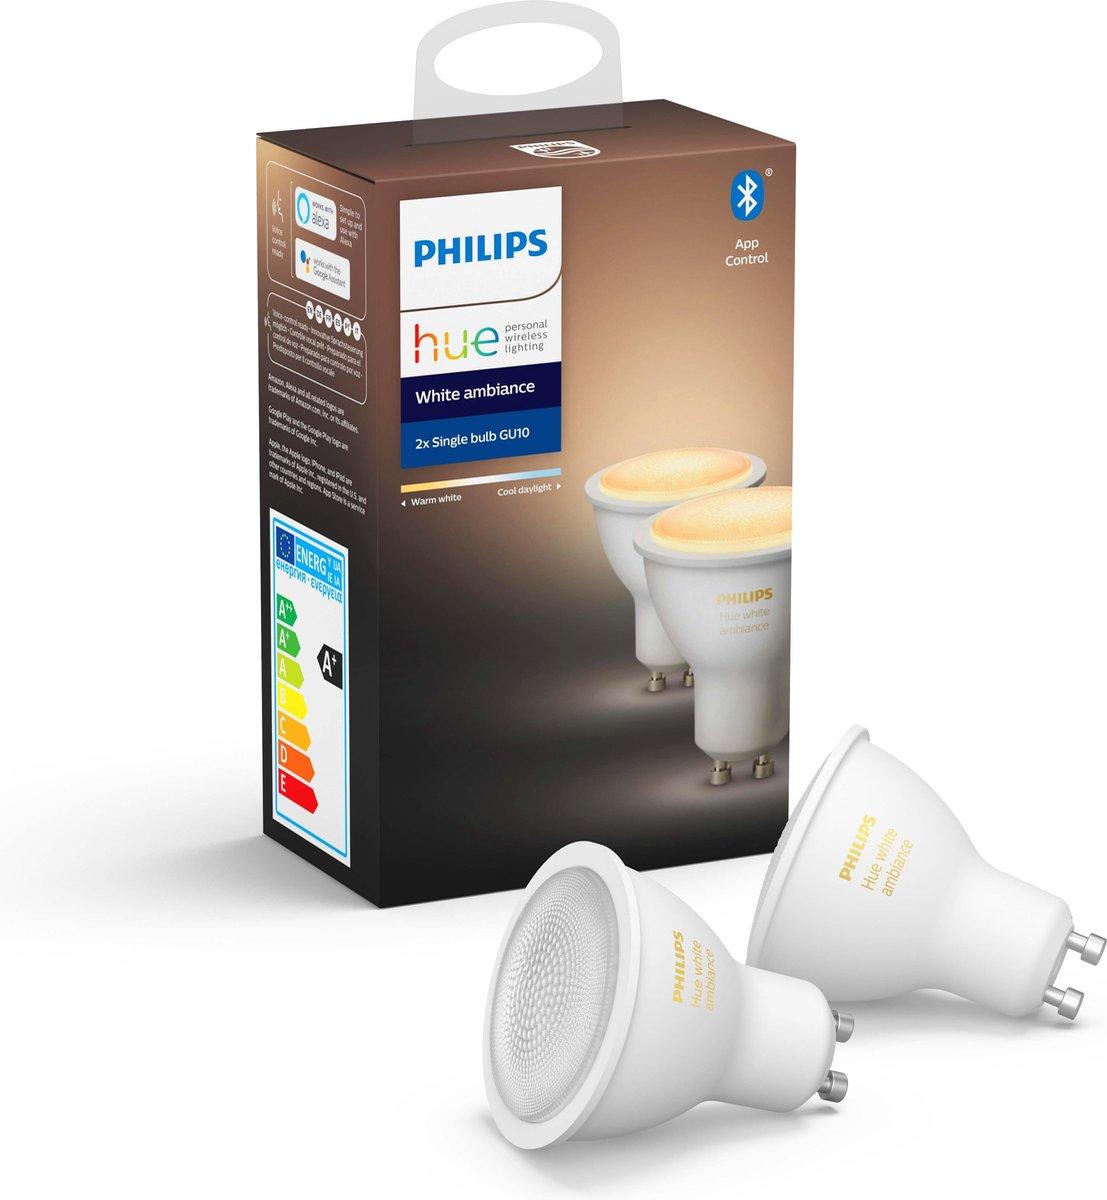 Philips Hue GU10 Duo Pack – White Ambiance – Bluetooth